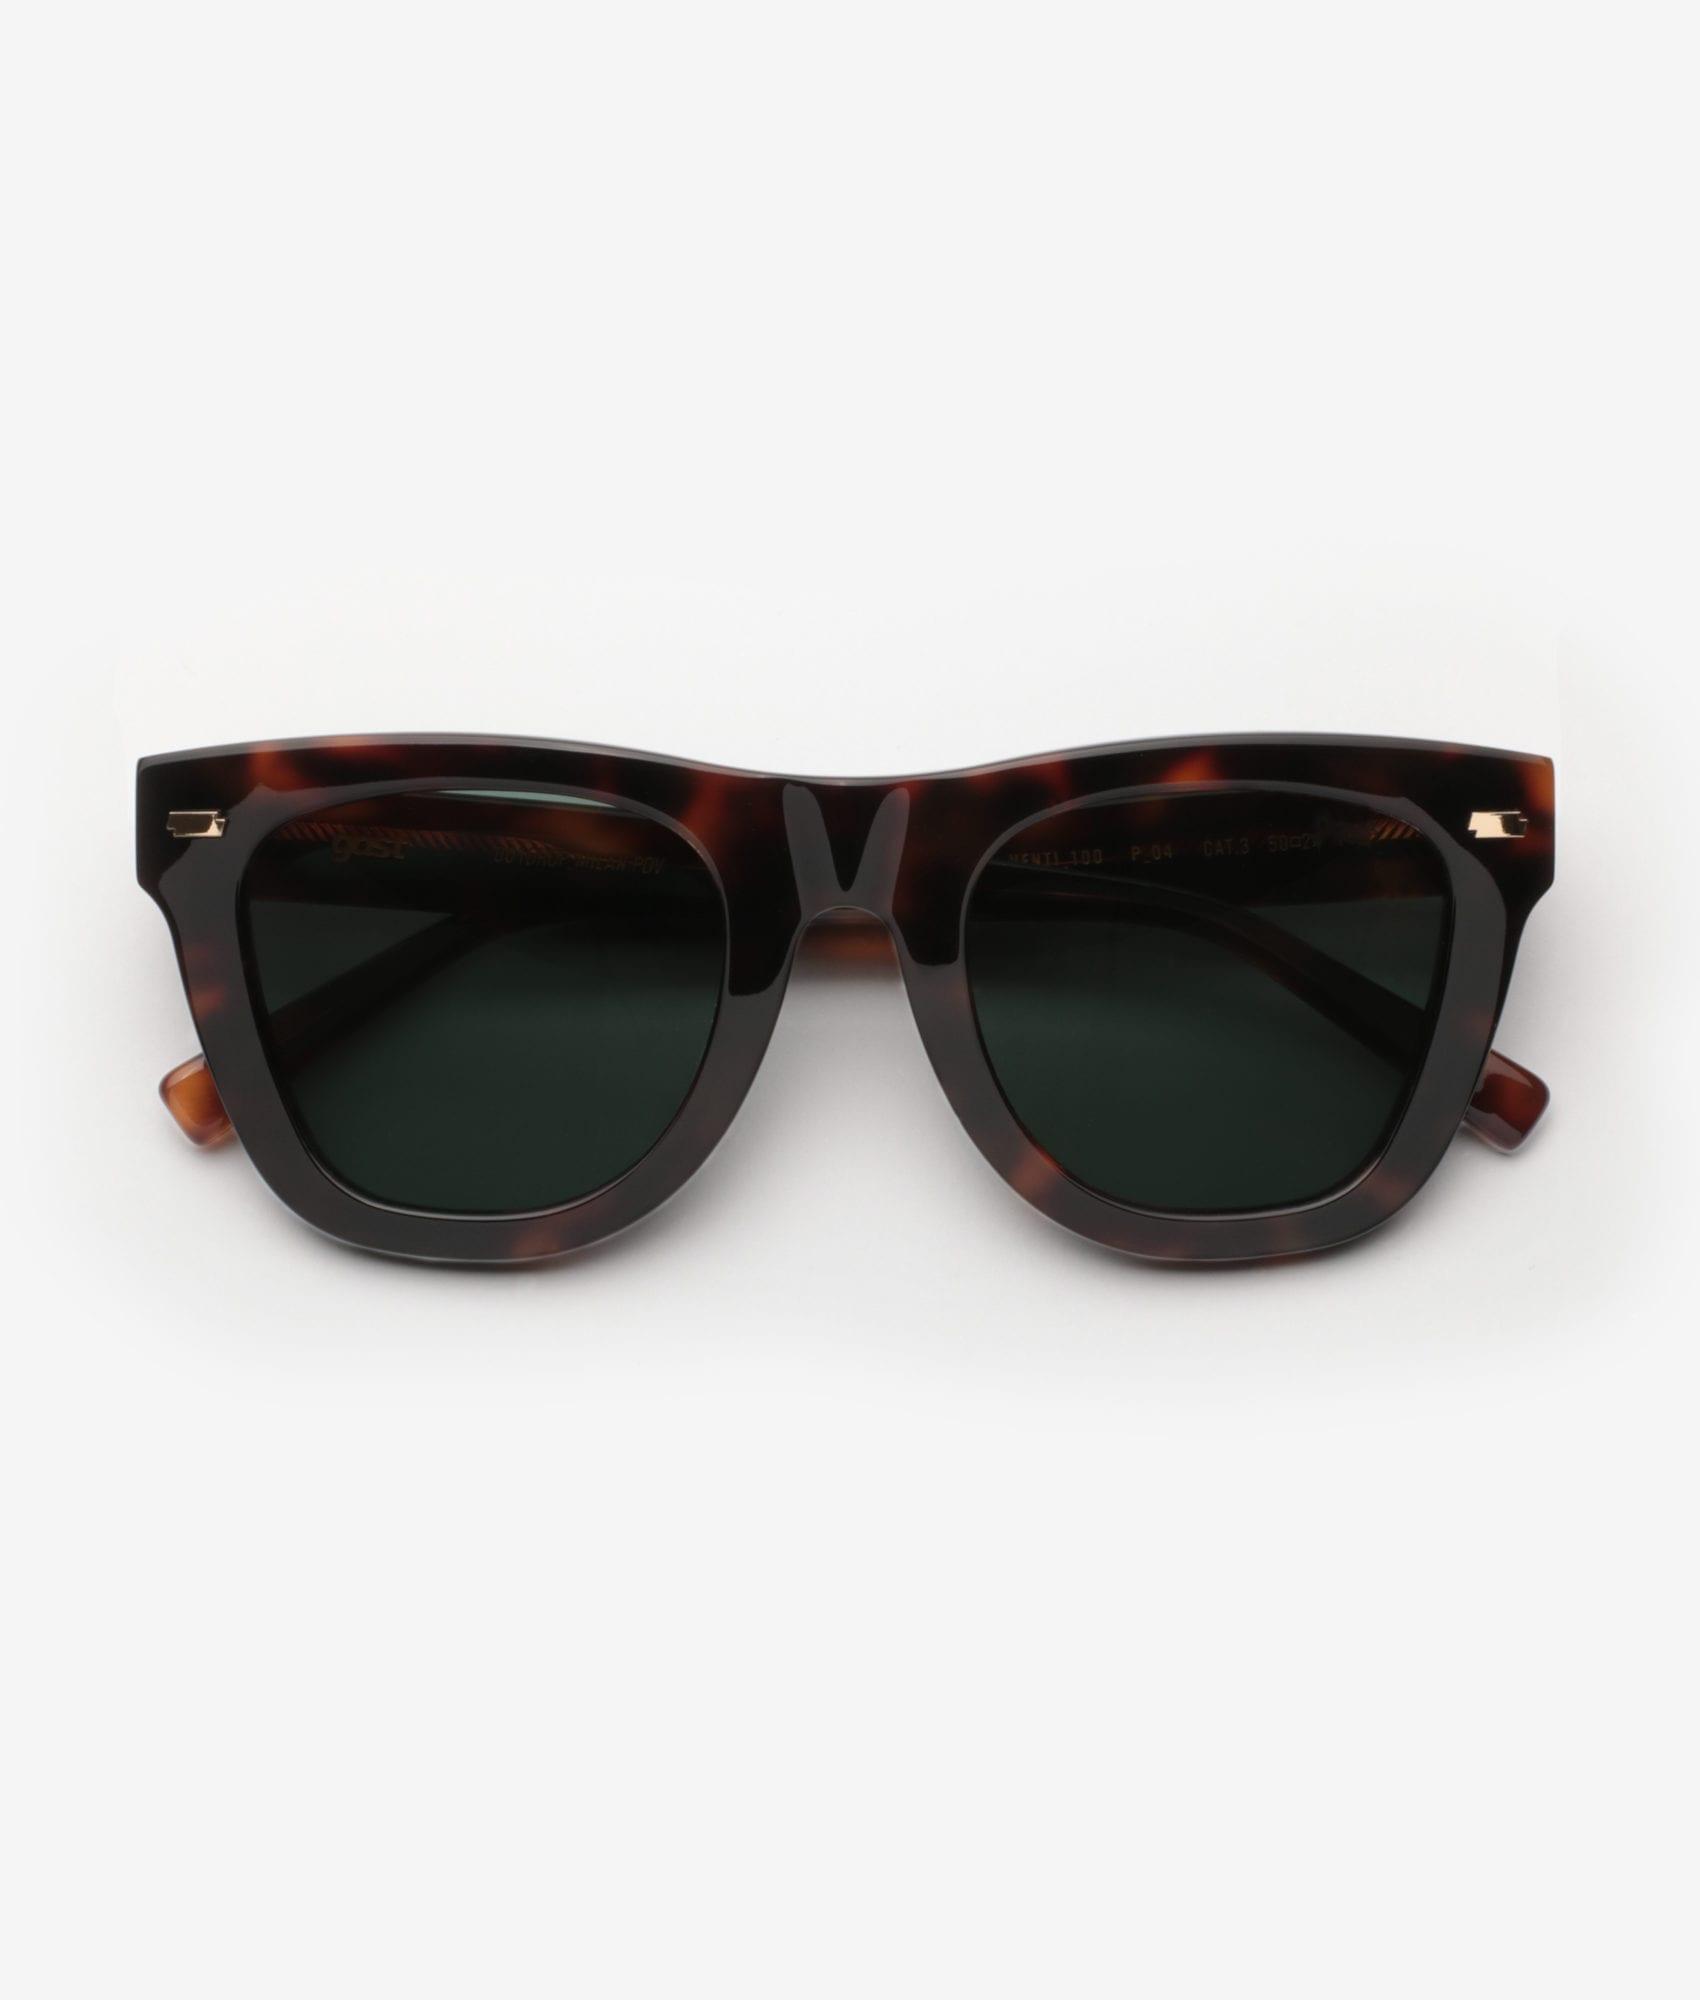 VENTI 100 Havana Gast Sunglasses